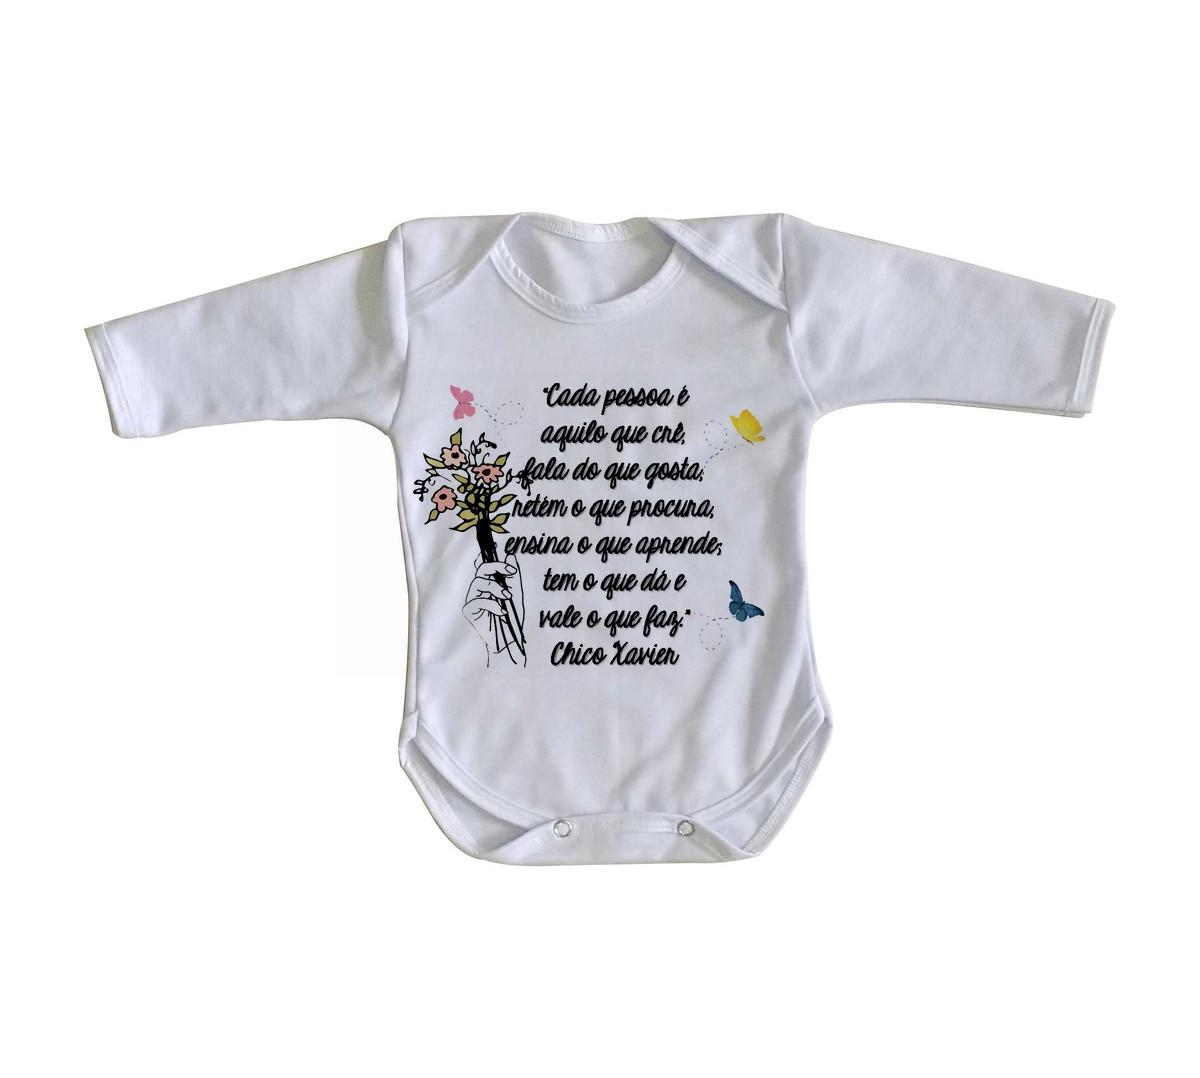 Body Bebê Roupa Nenê Frase Chico Xavier Espirita Cada Pessoa